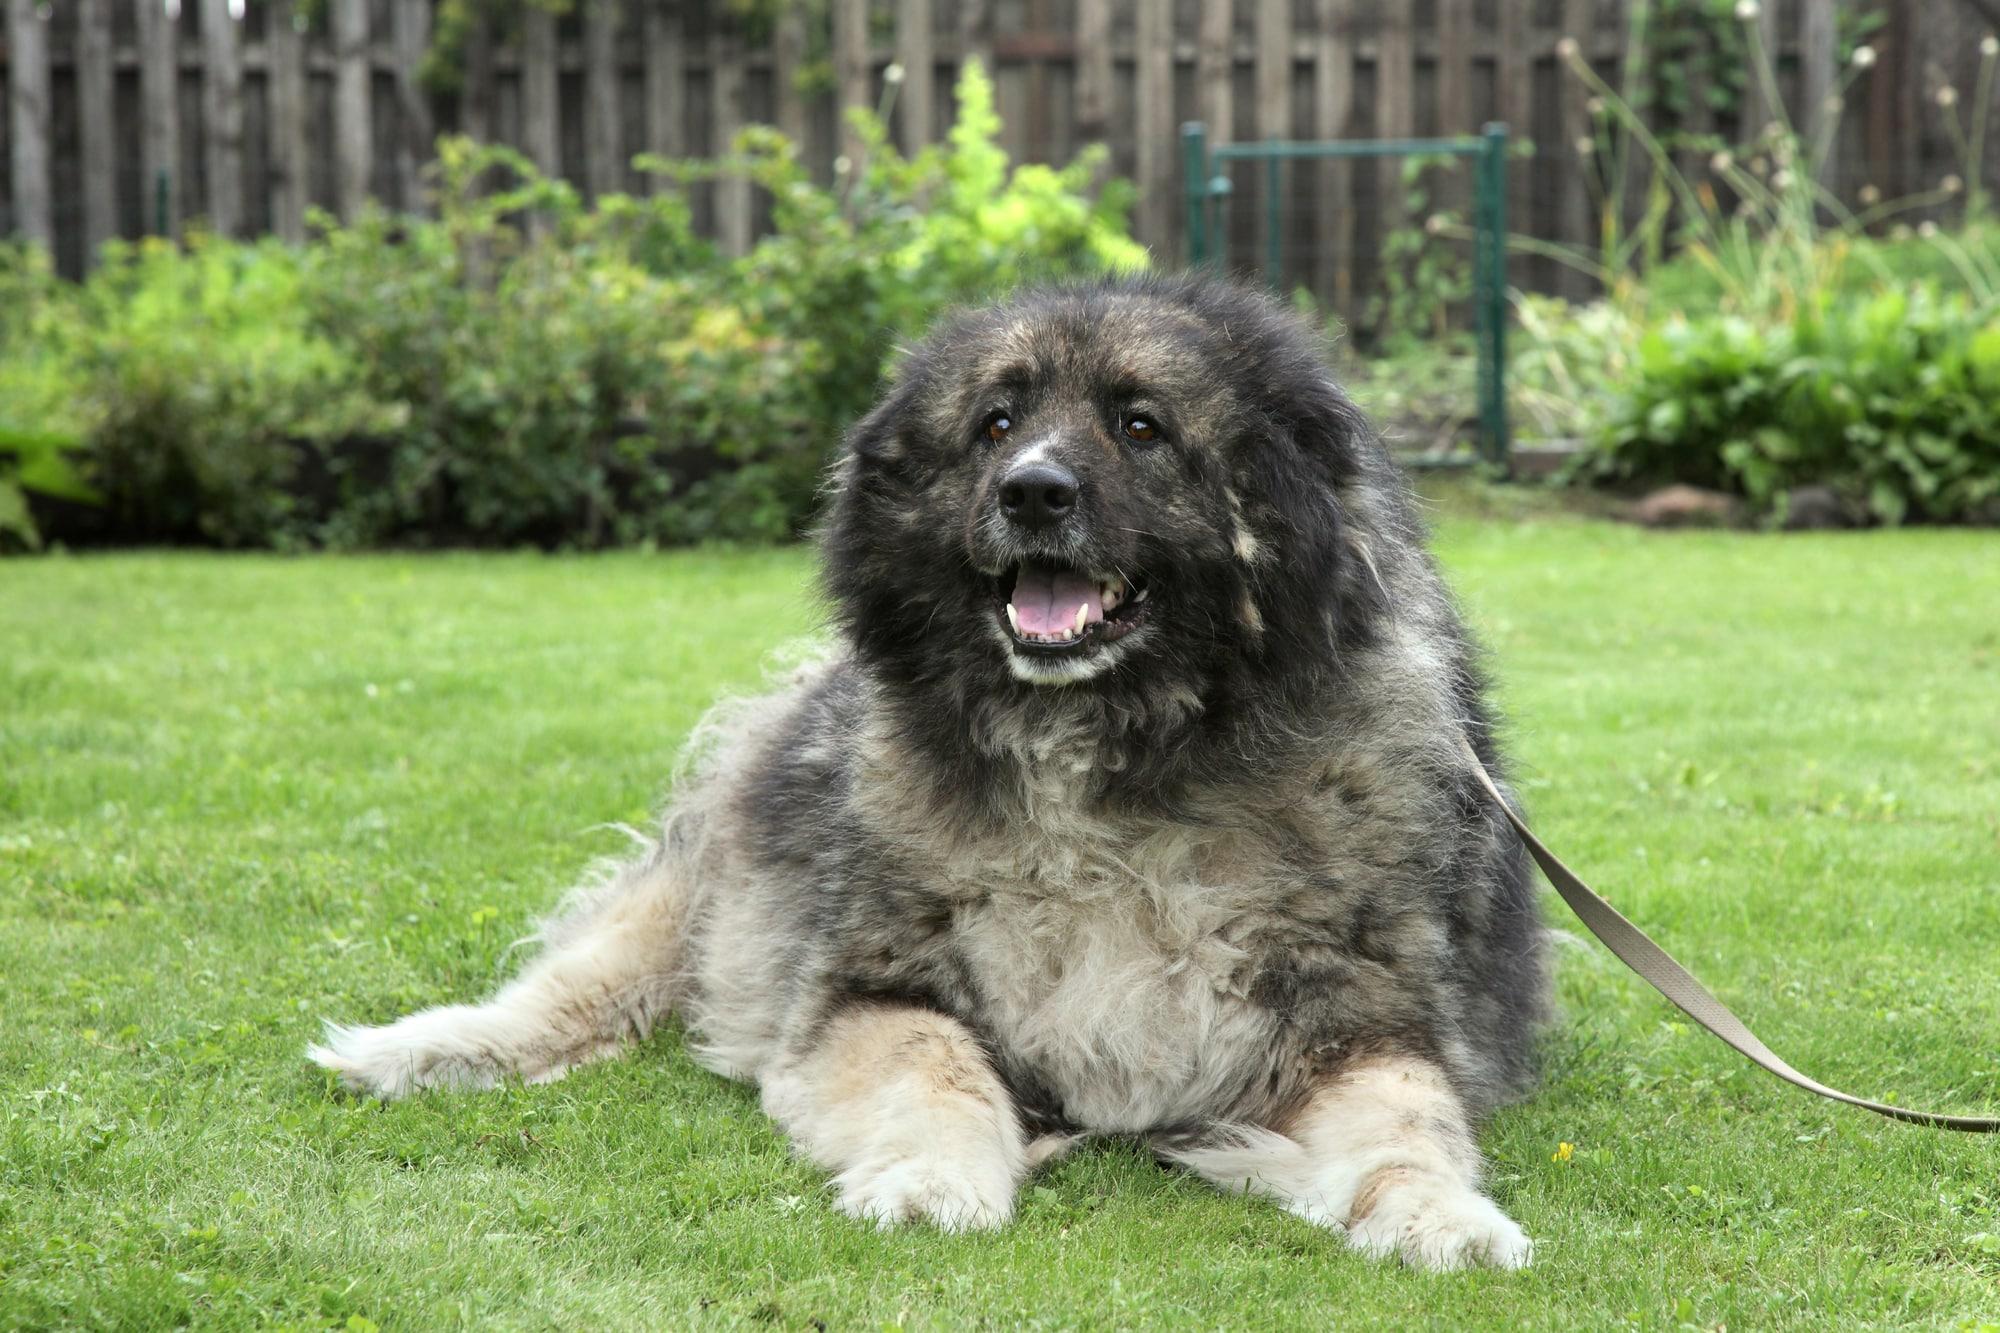 Adult Caucasian Shepherd dog lying on grass. Outdoor